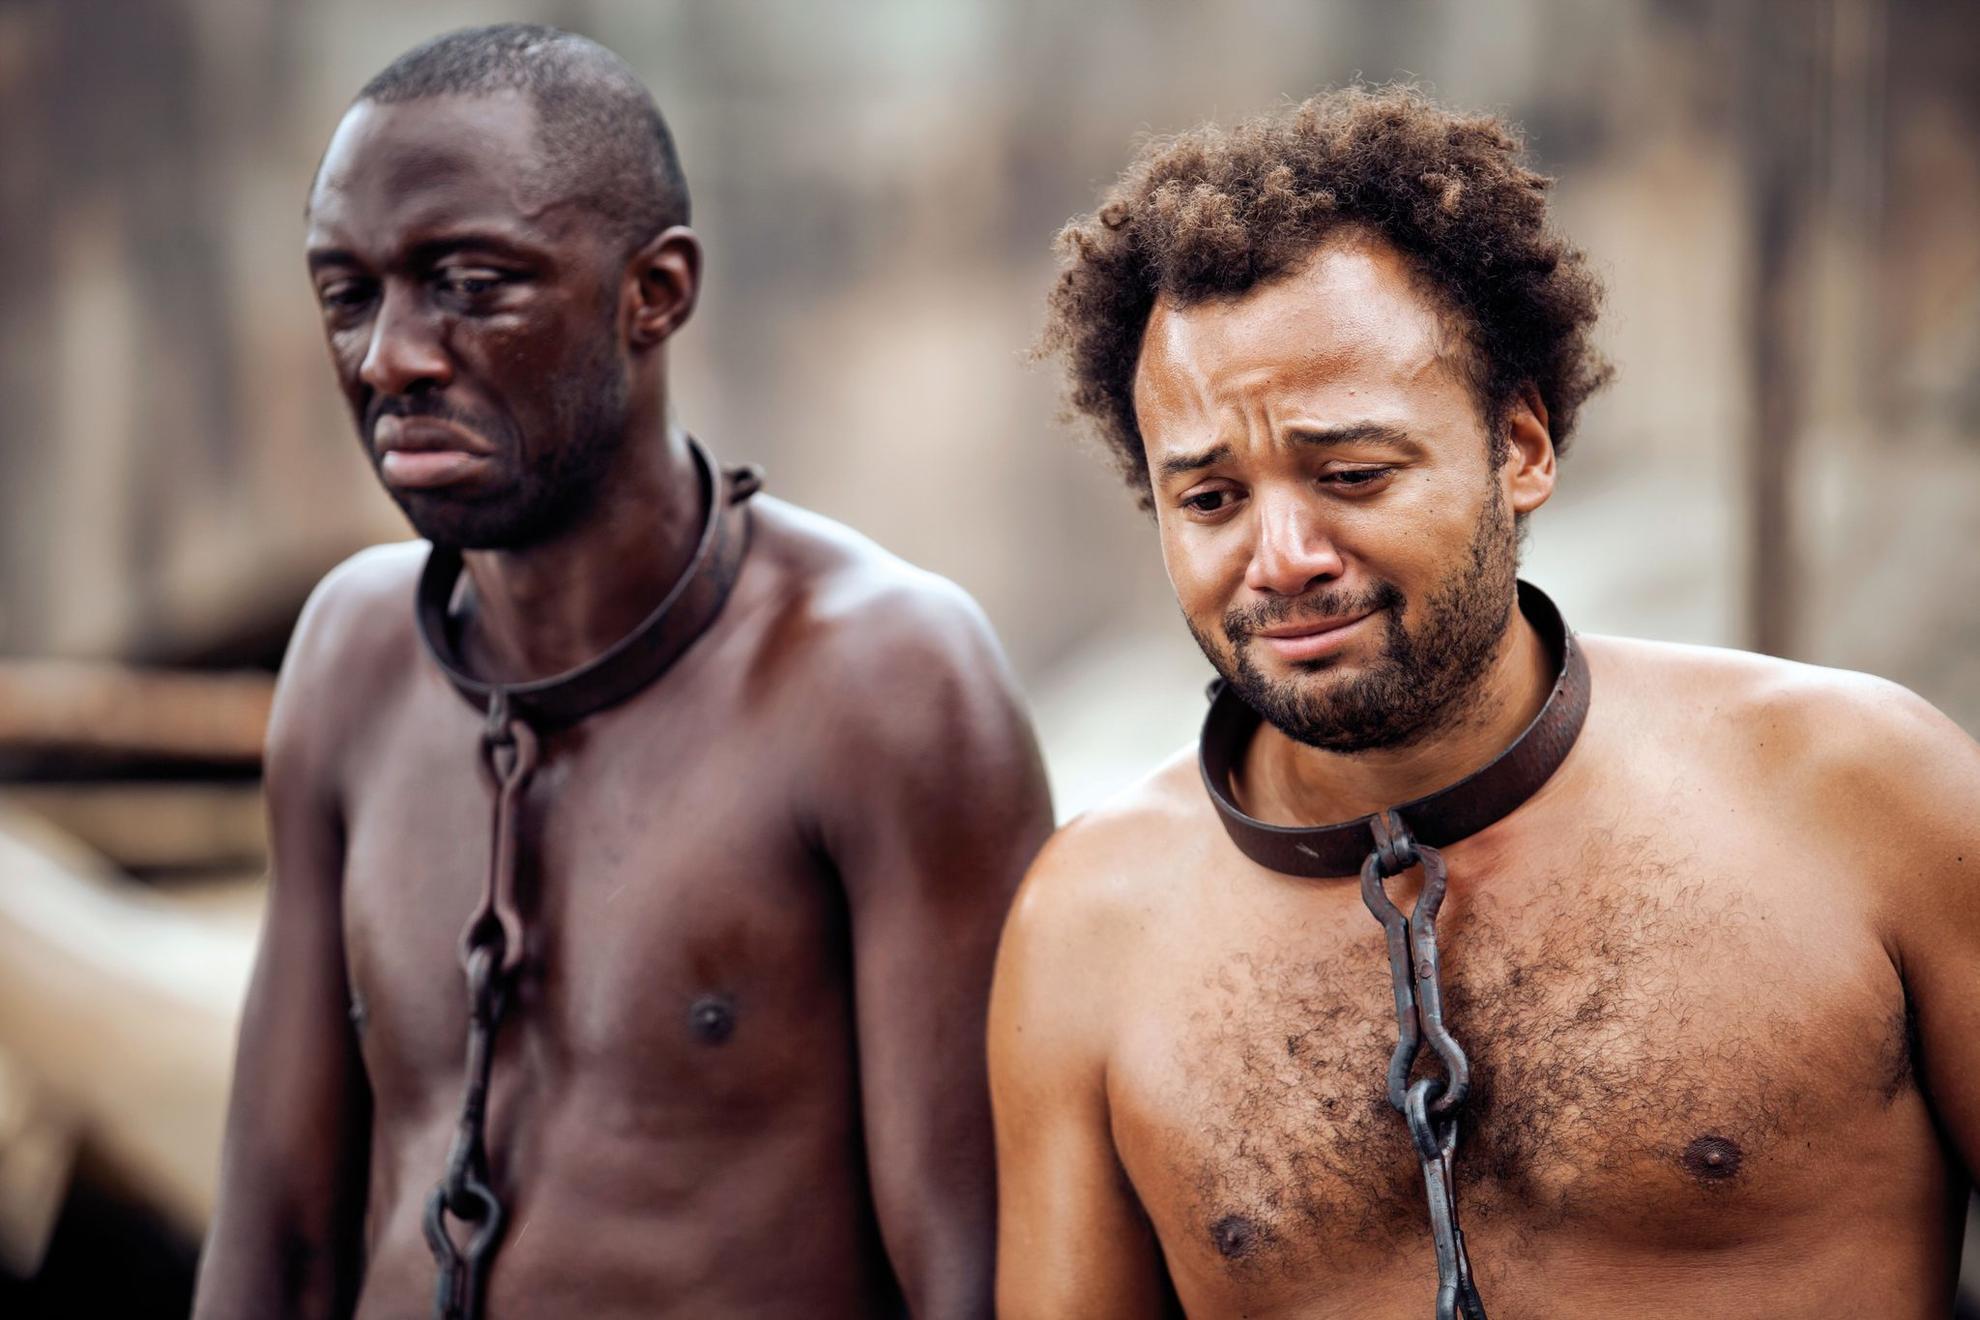 фото хозяин и рабы - 6